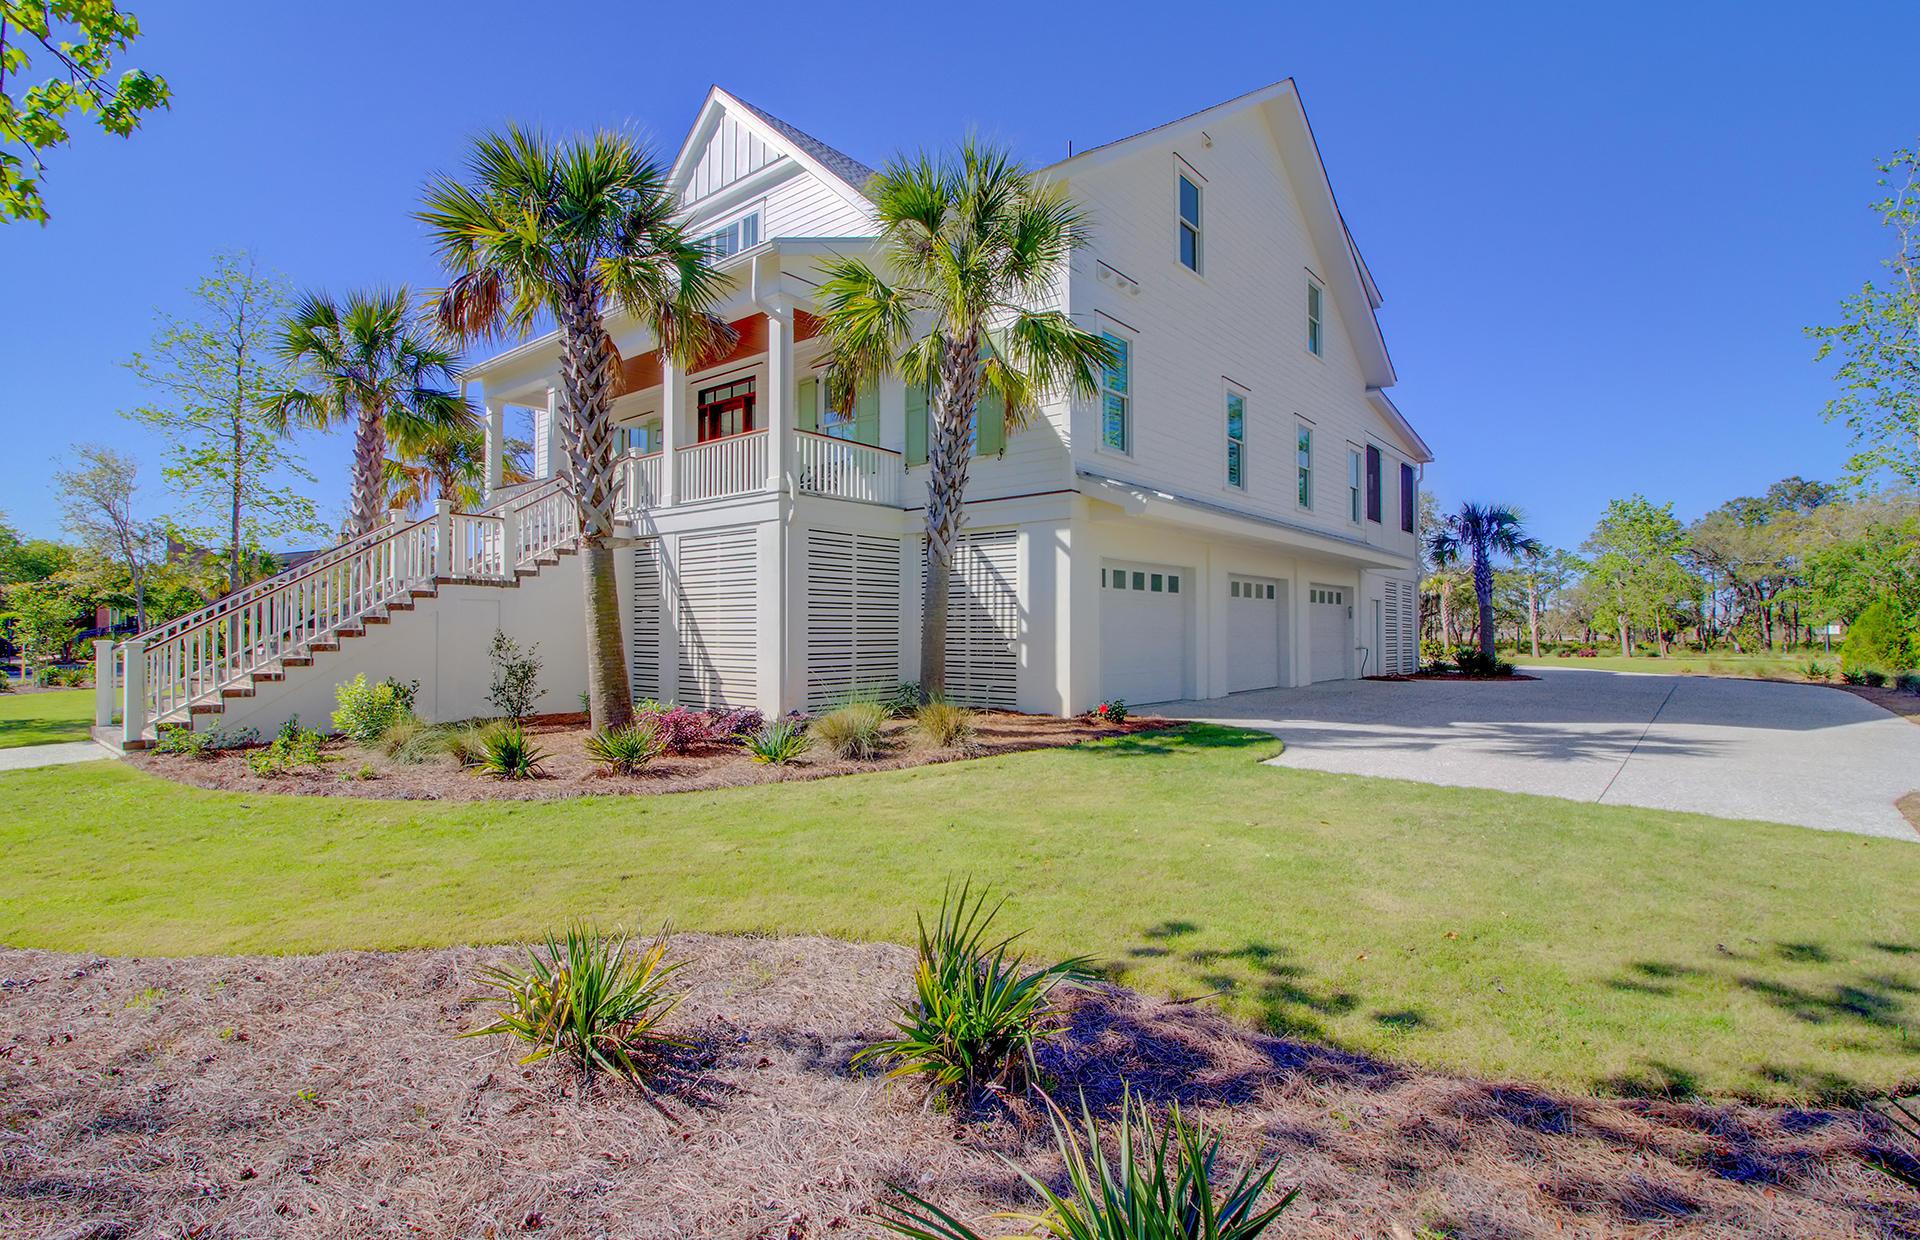 Beresford Hall Homes For Sale - 253 Grand Park, Charleston, SC - 21